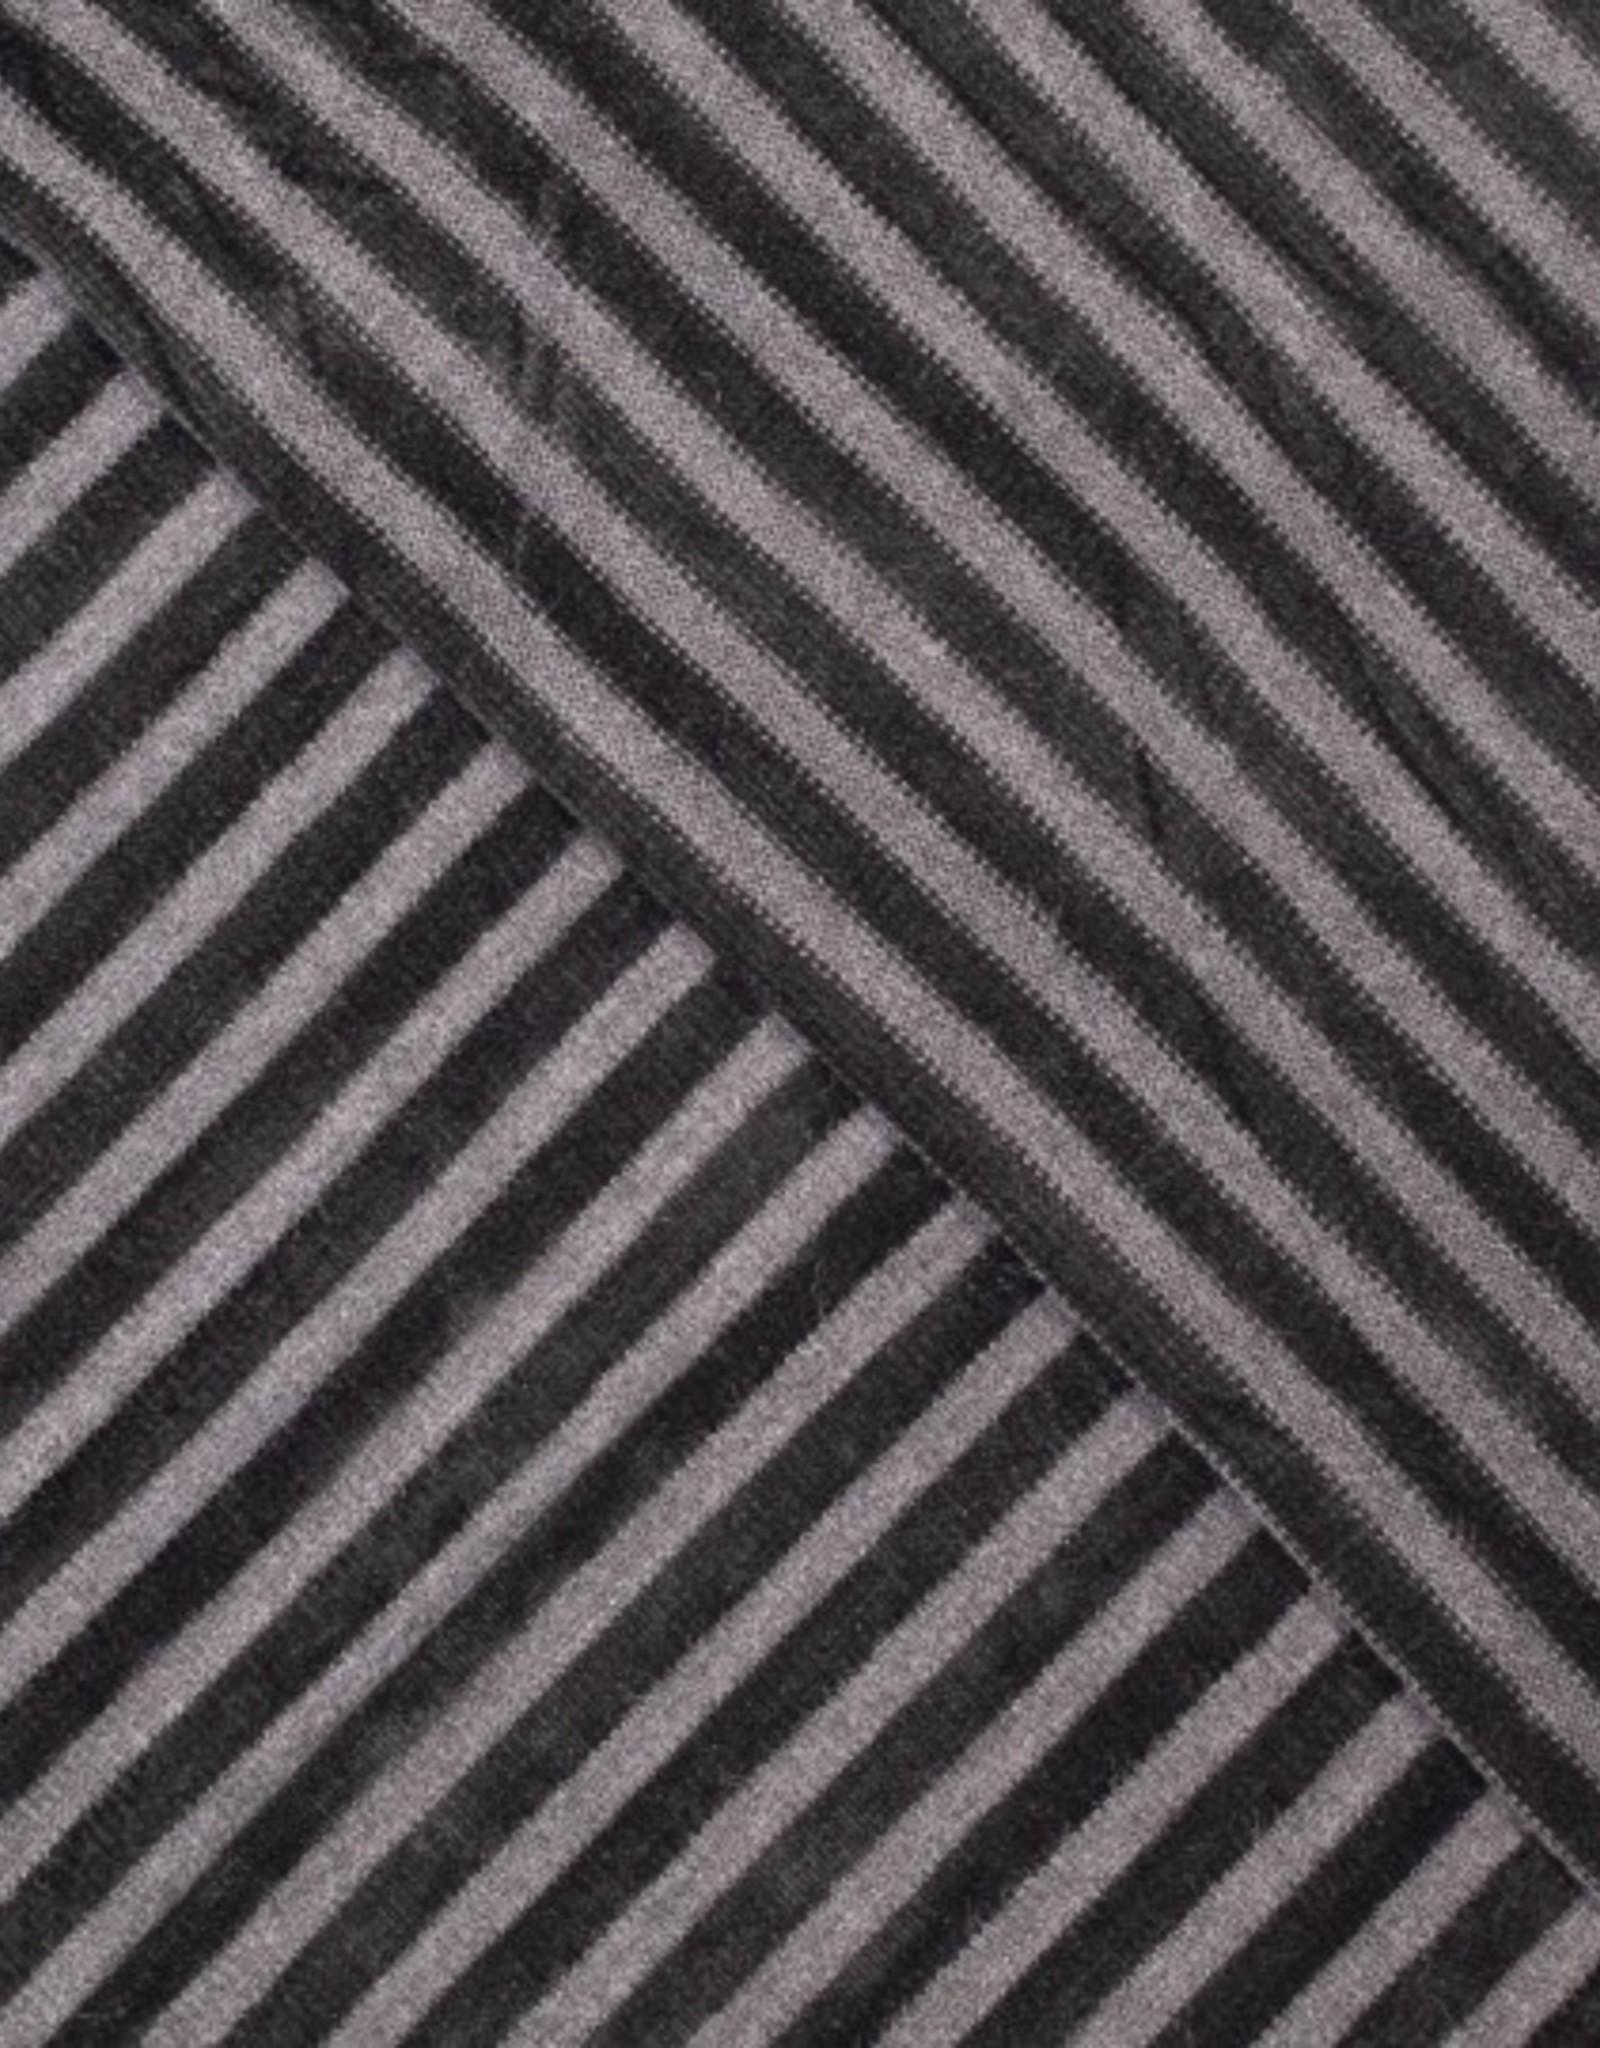 COUPON Breisel gestreept soft zwart 120x150cm